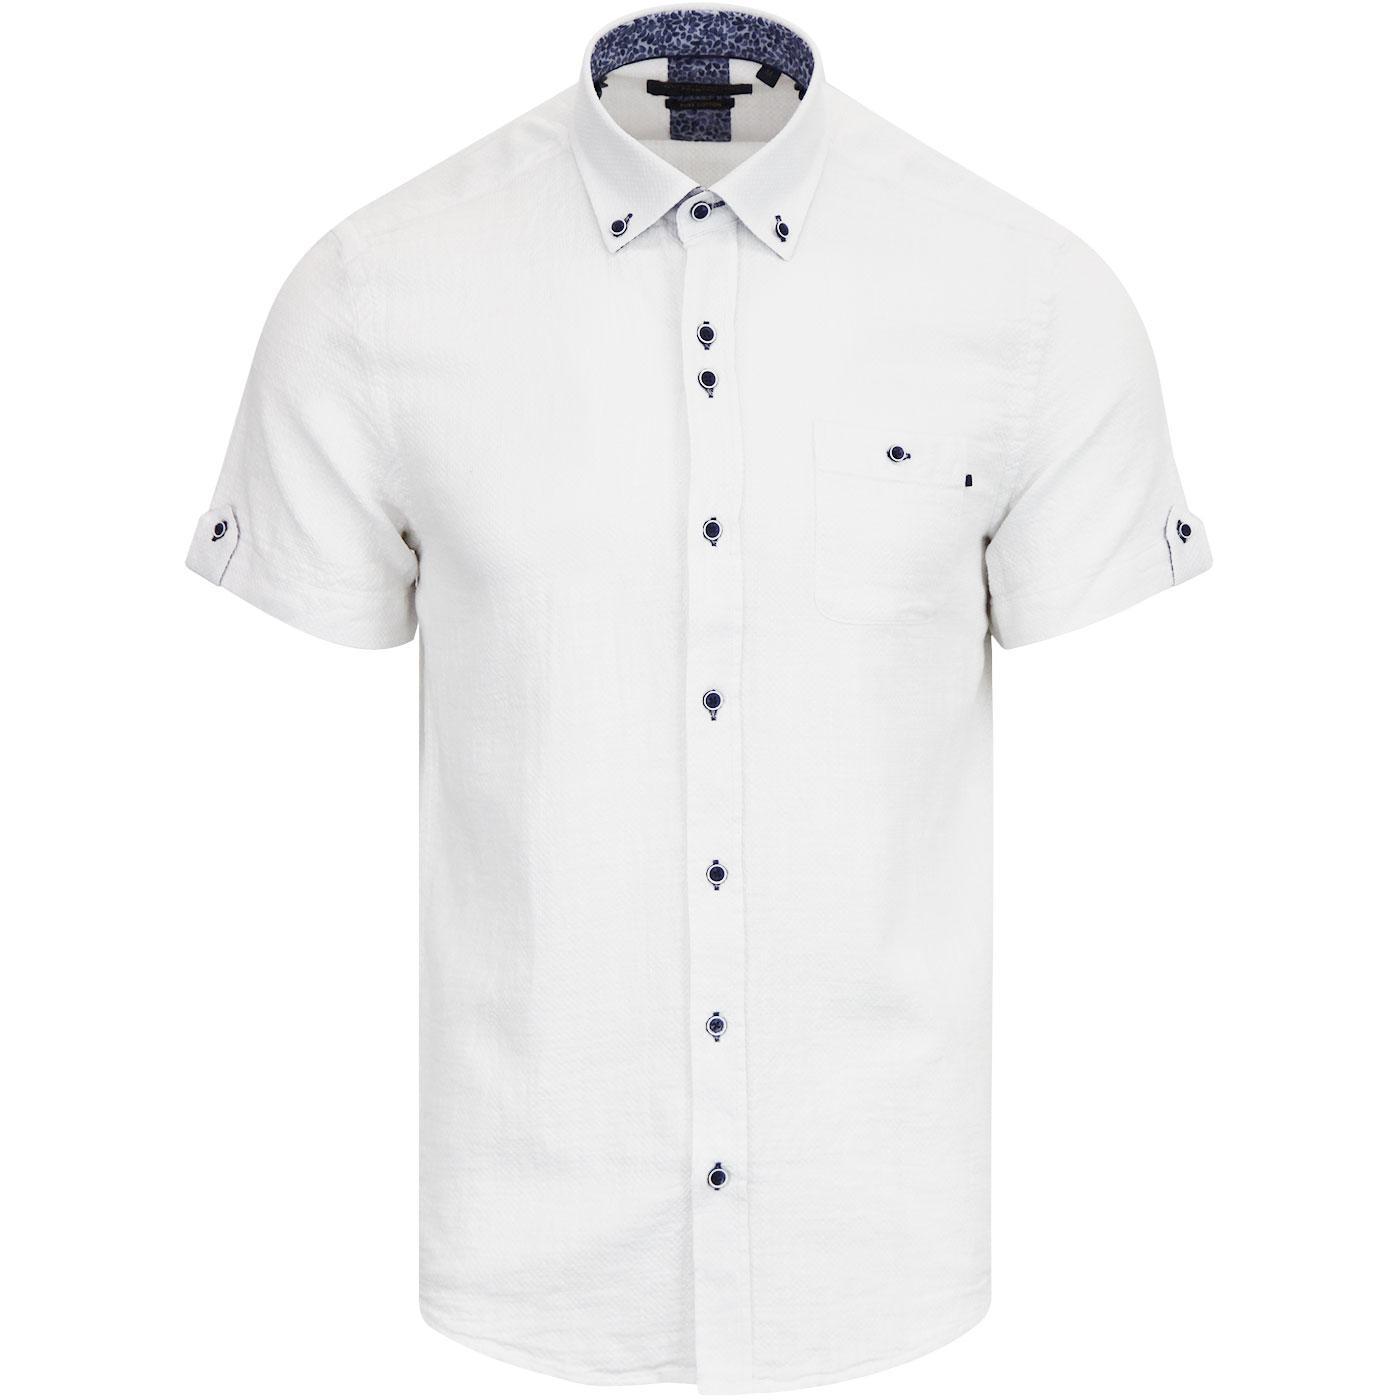 GUIDE LONDON Retro Mod Paisley Collar S/S Shirt W